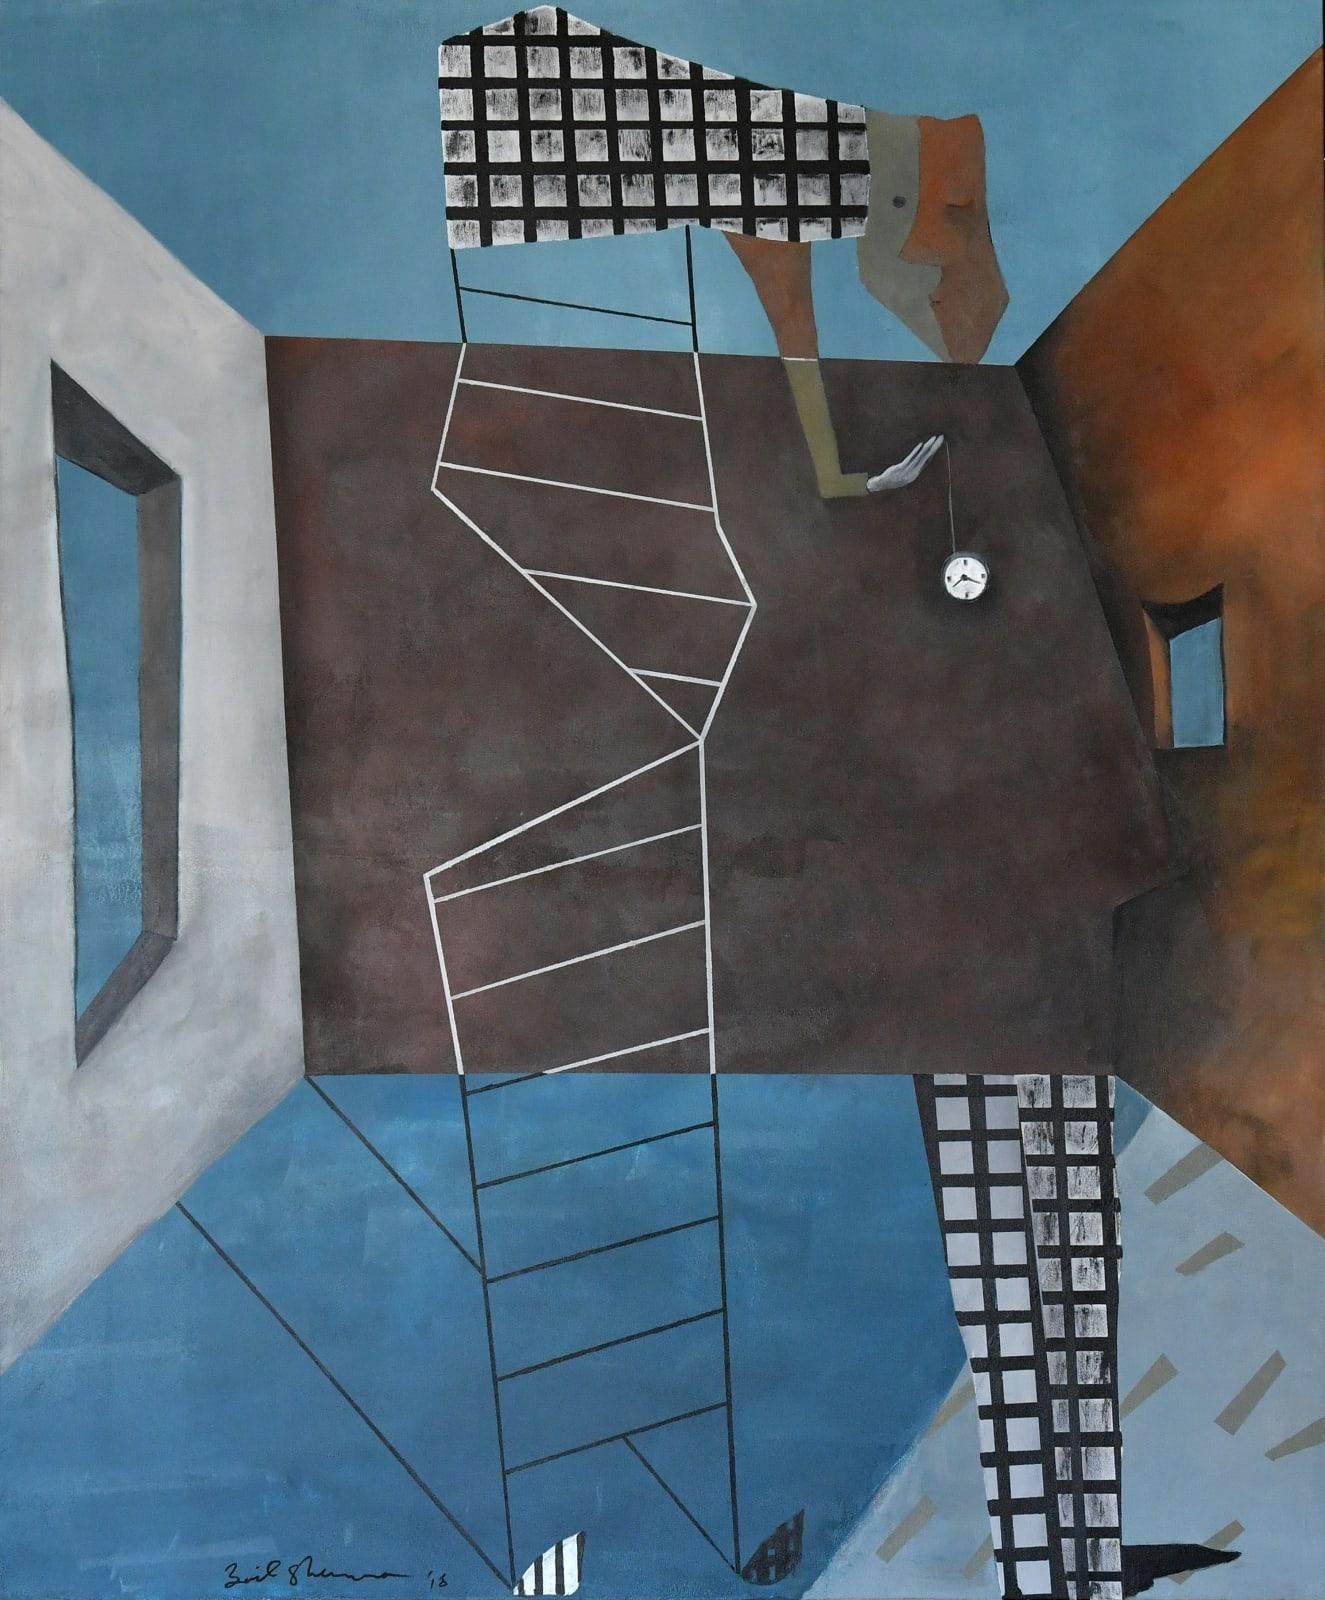 Zaid Shawwa, Time to go home, 2018, Acrylic on canvas, 120x100cm